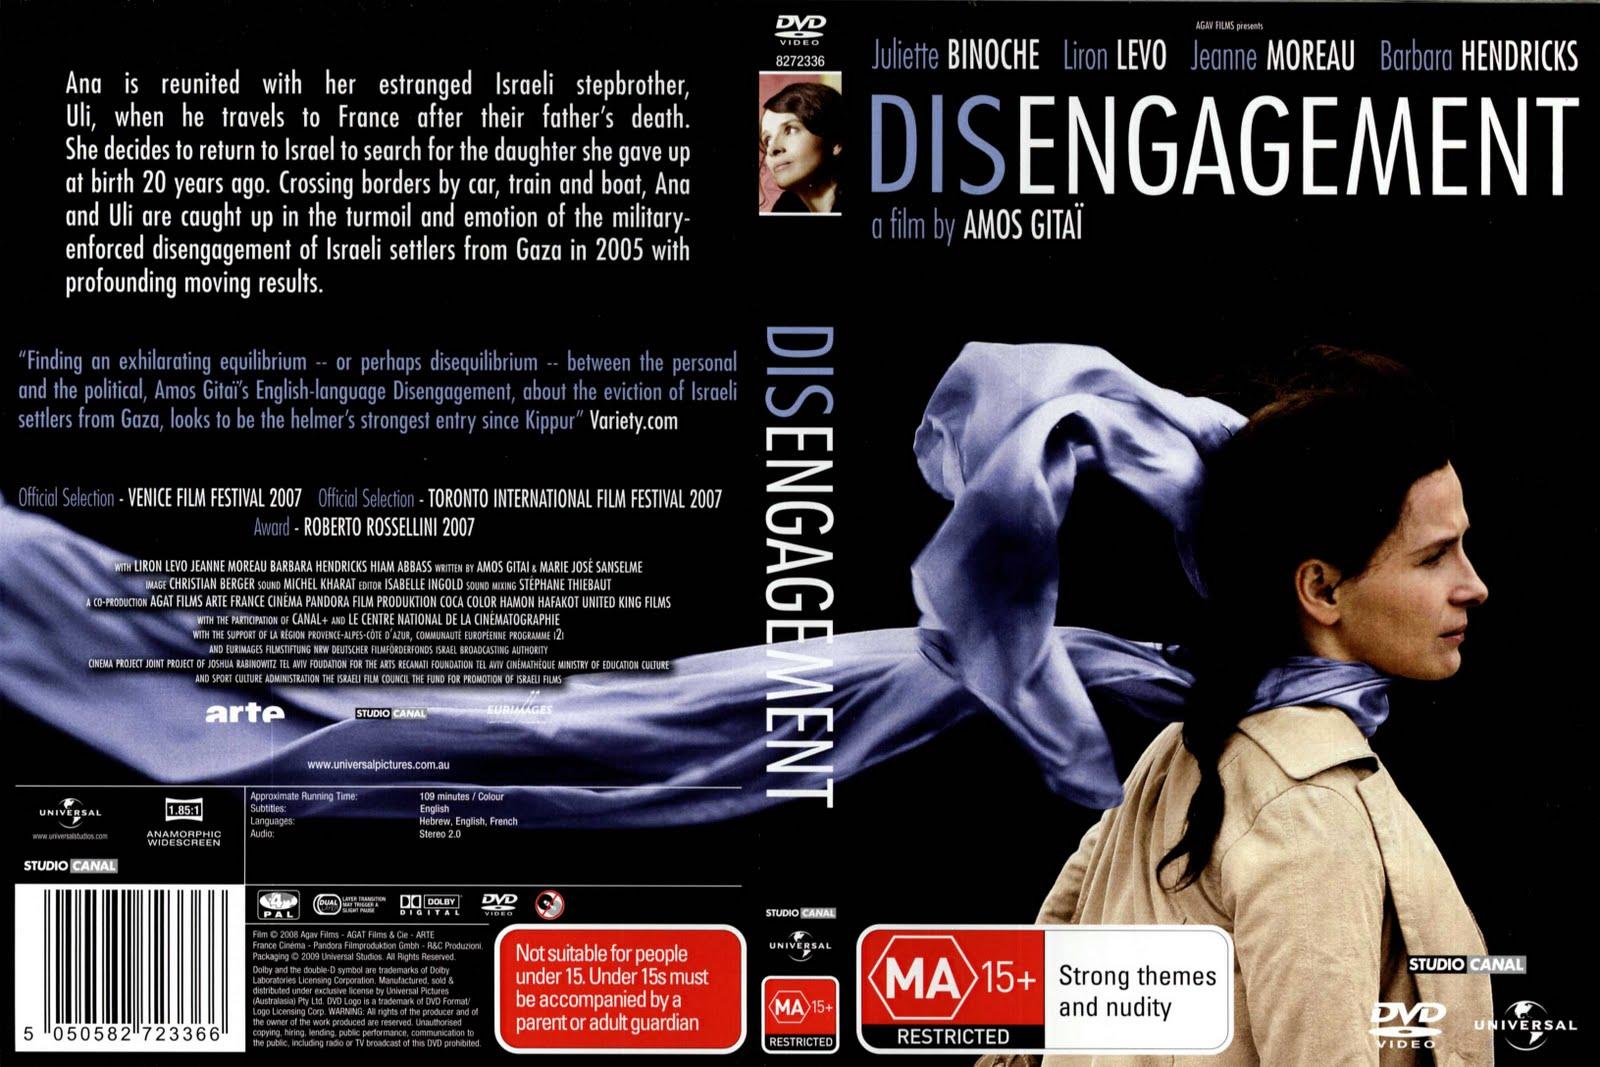 http://2.bp.blogspot.com/_yCRo3KNp-Uo/TSPRgWAXAfI/AAAAAAAACzo/o7BwOho3GcE/s1600/Disengagement.jpg